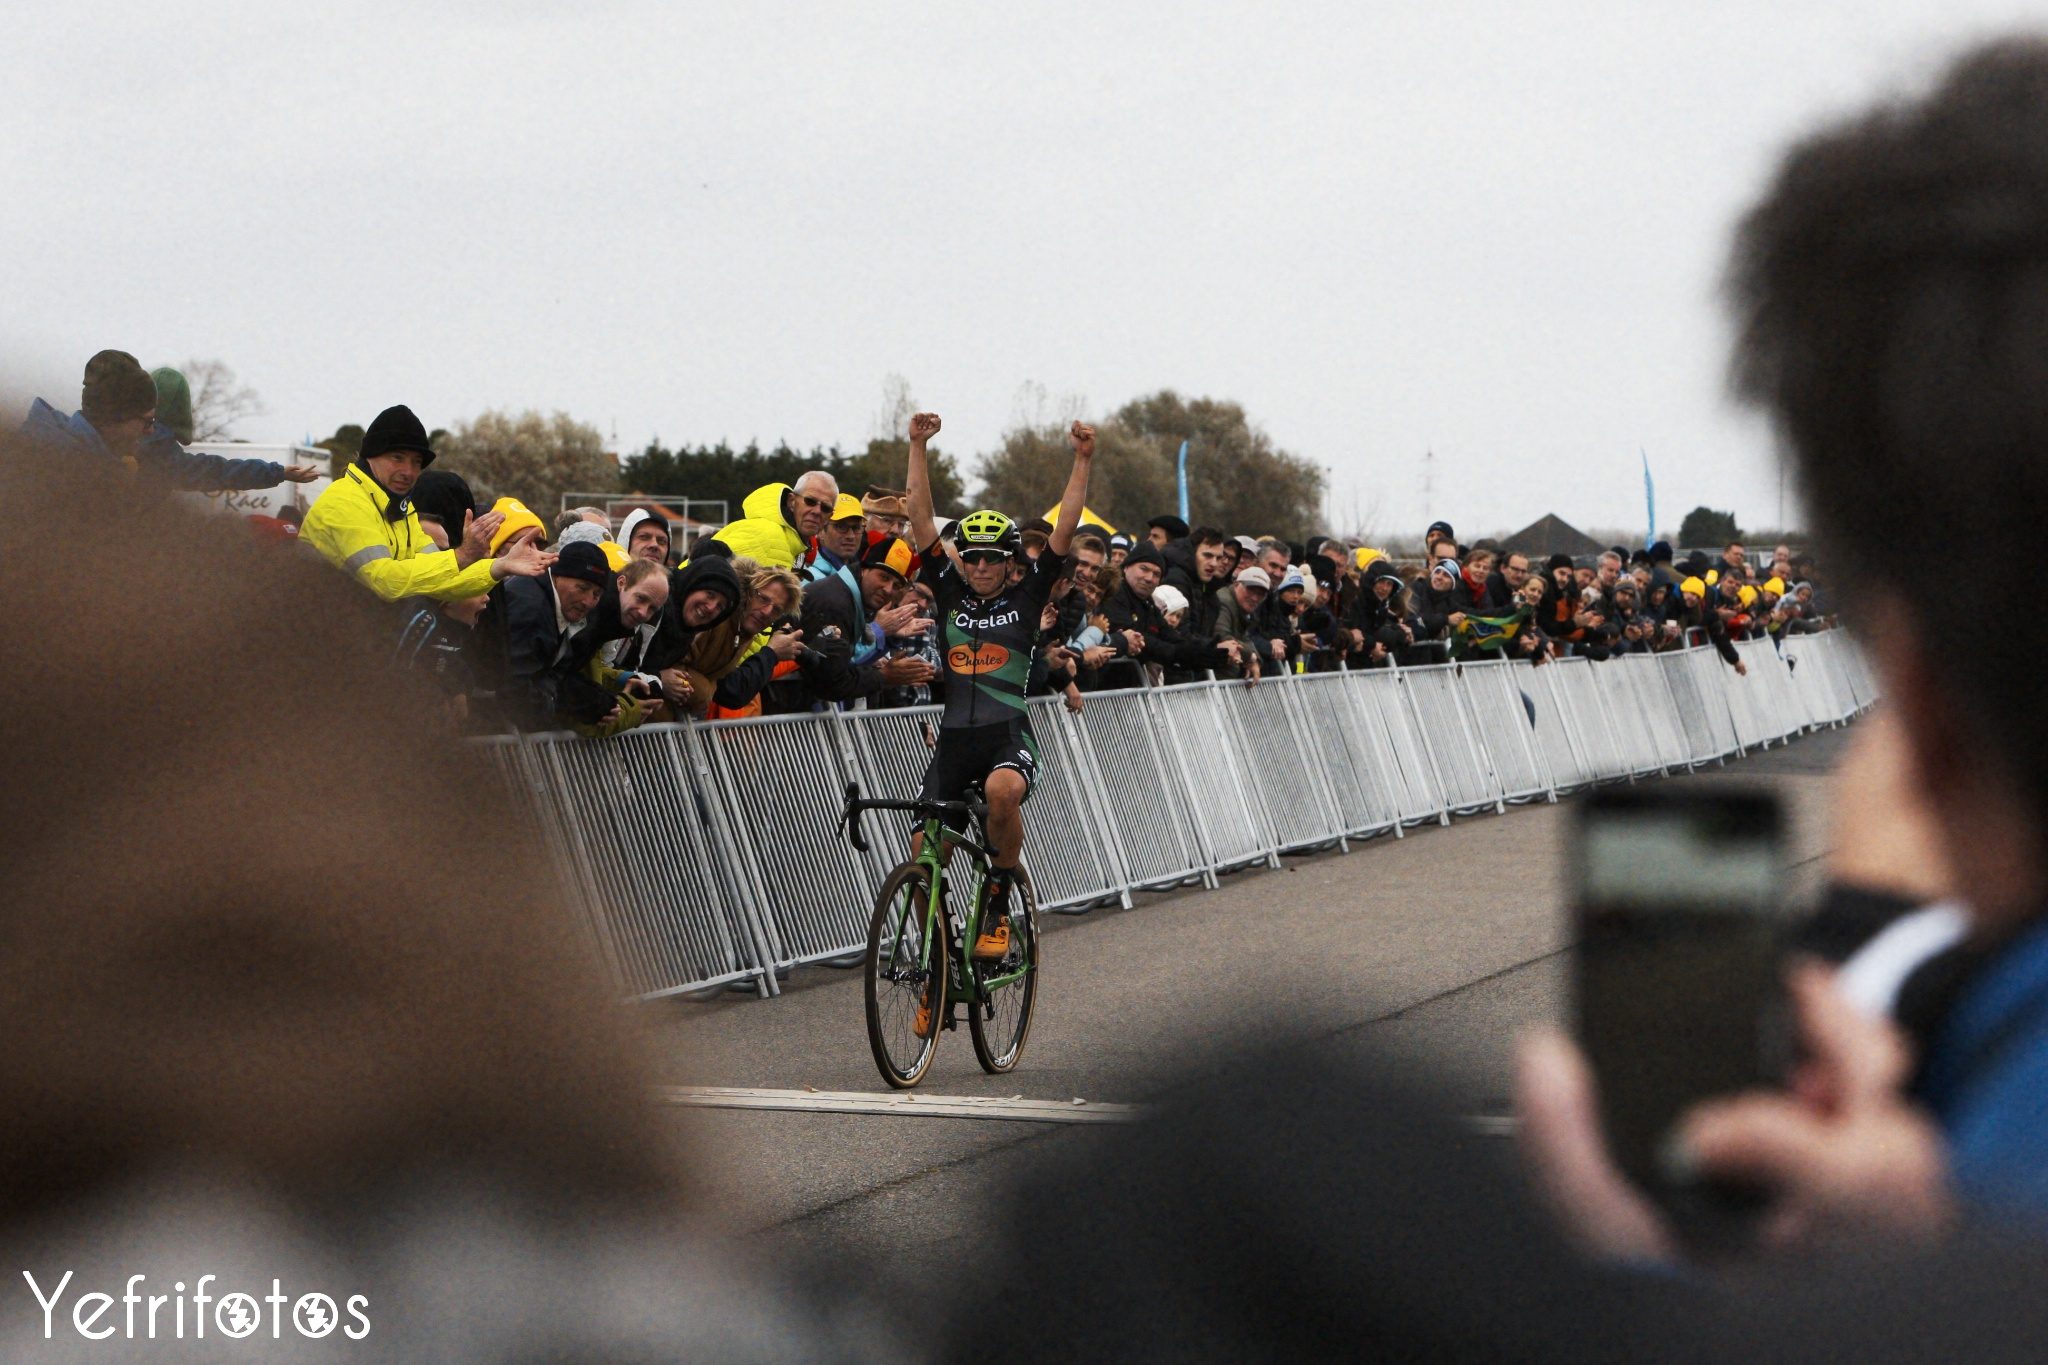 Koksijde - UCI Cyclocross World Cup - Maud Kaptheijns